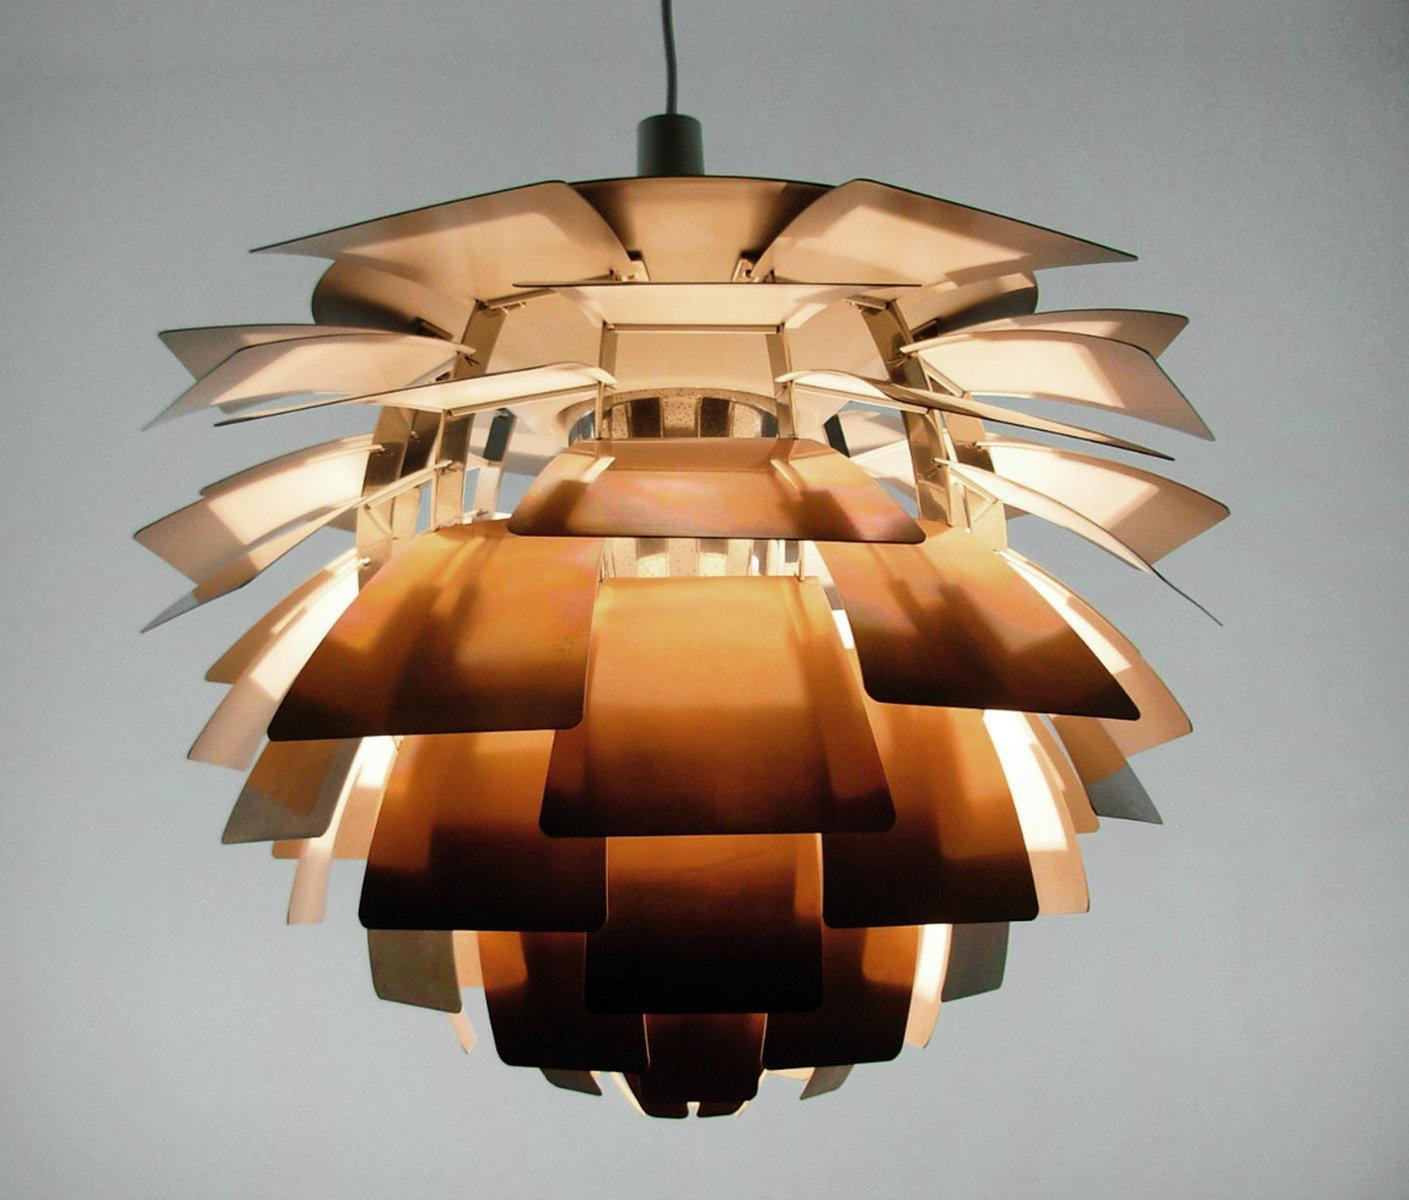 Elegant Vintage Artichoke Lamp By Poul Henningsen For Louis Poulsen For Sale At  Pamono